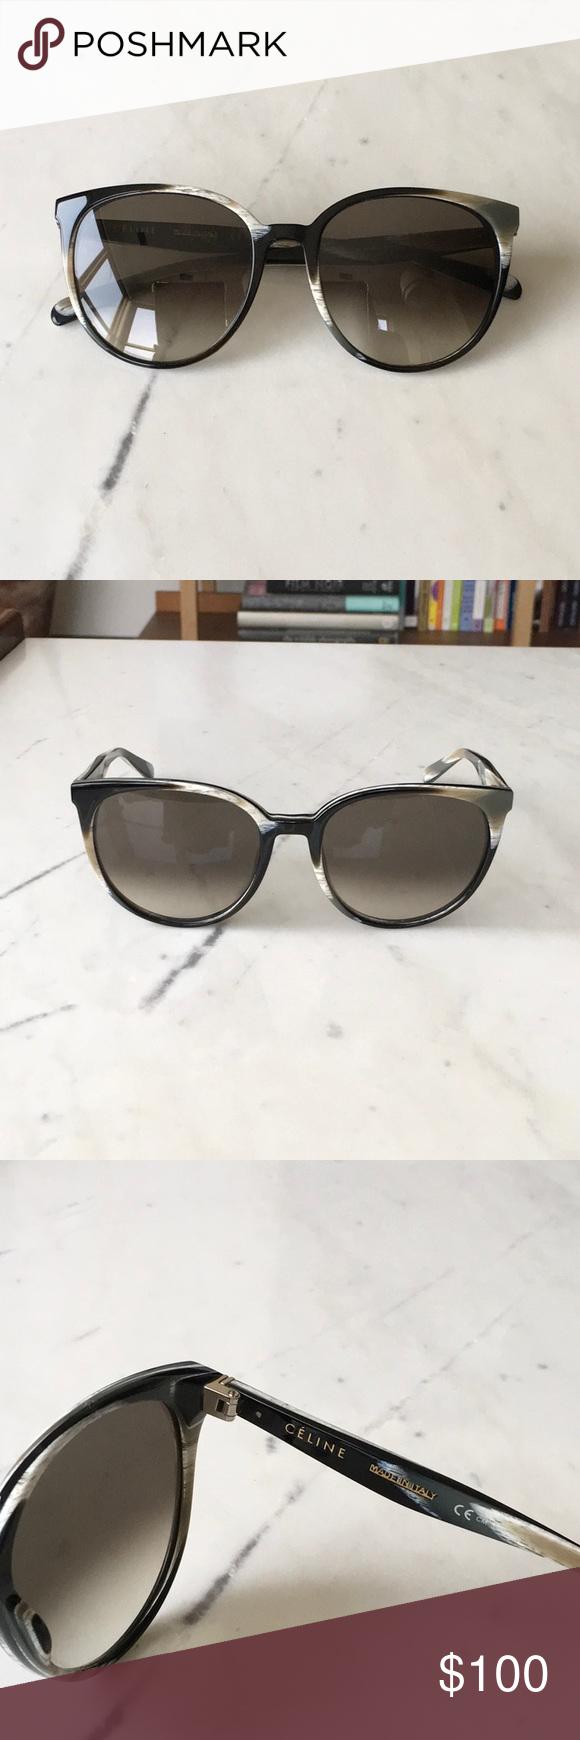 a20888de33724 Celine Thin Mary Sunglasses CL 41068 S Lovely Celine sunglasses with unique  white